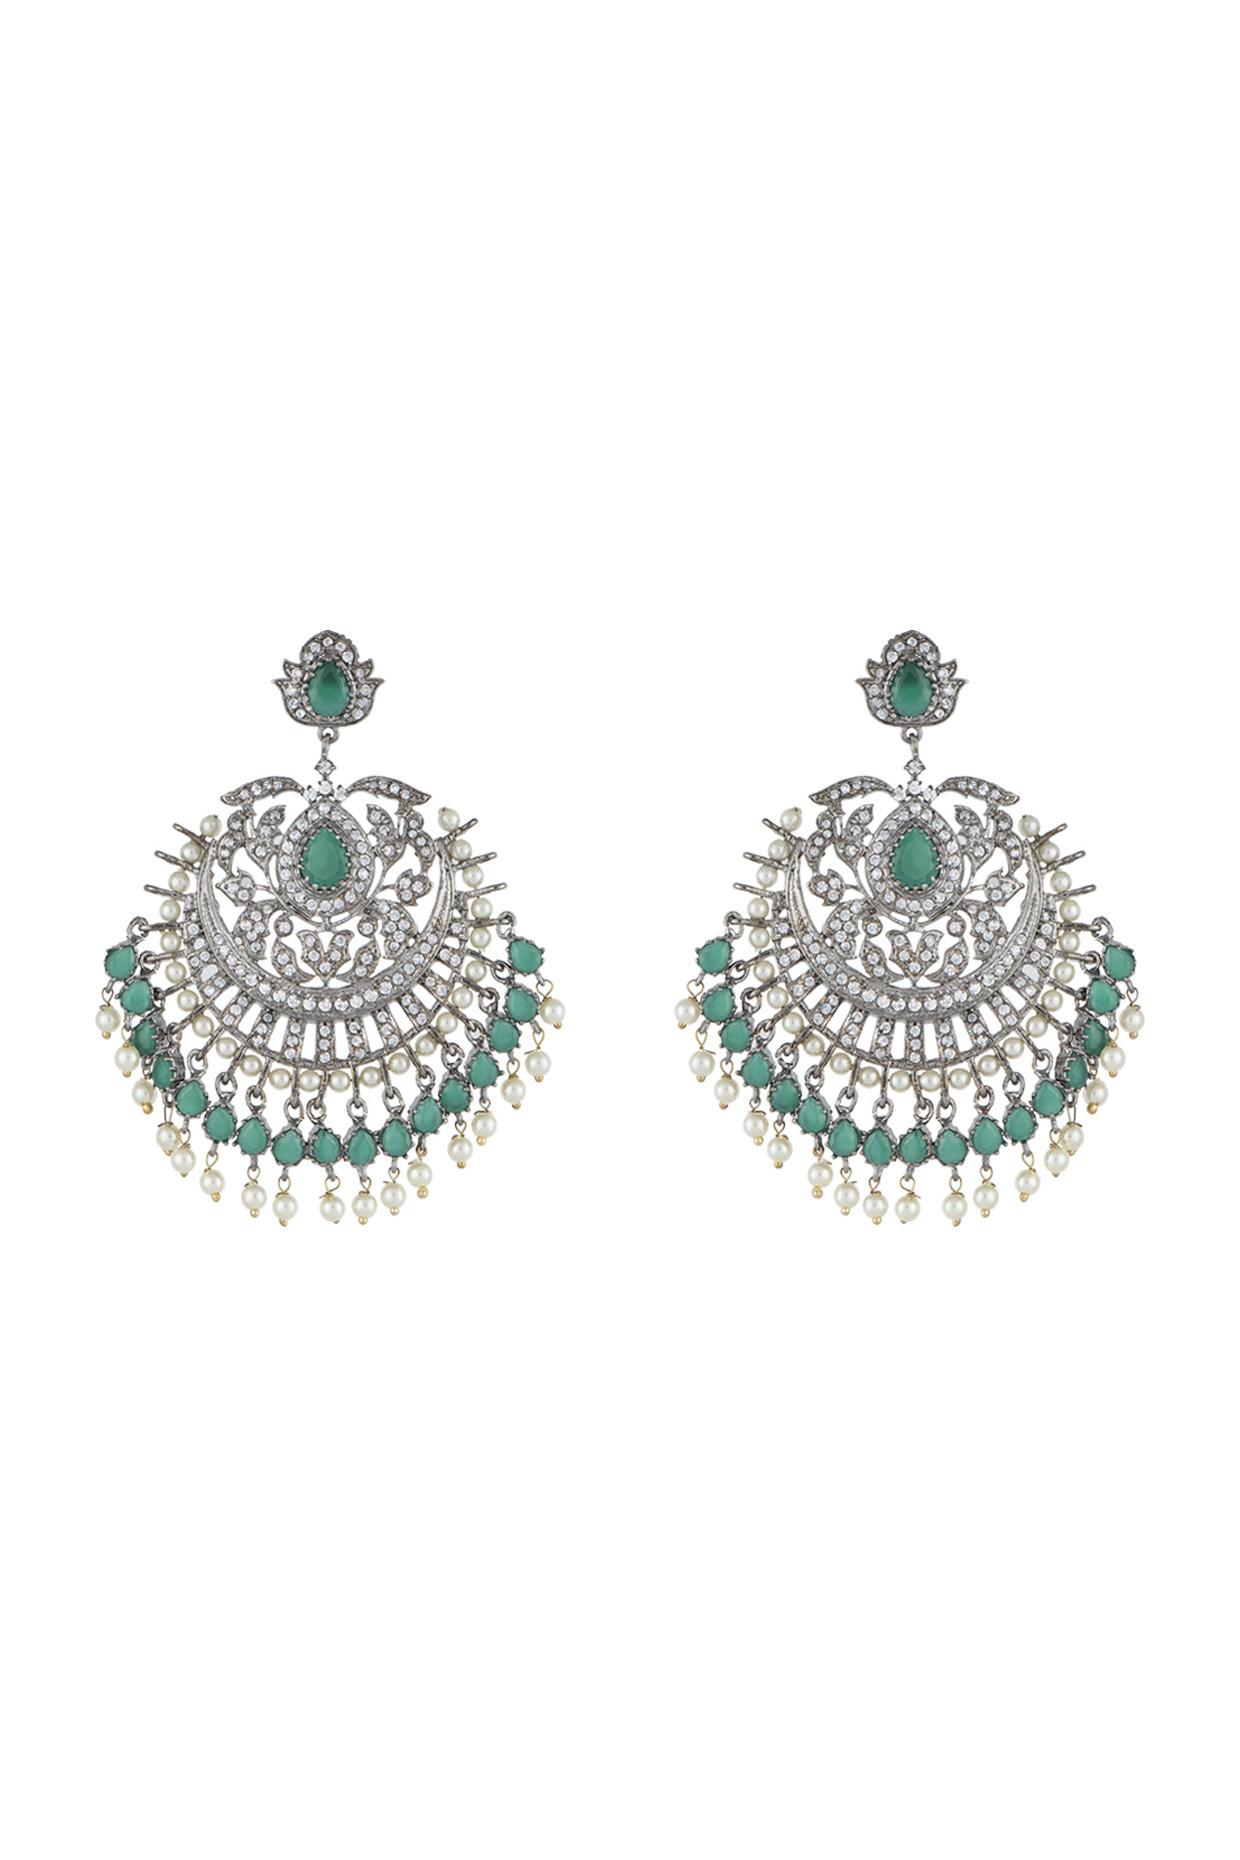 Silver Plated Faux Diamond & Green Pearls Dangler Earrings by Aster